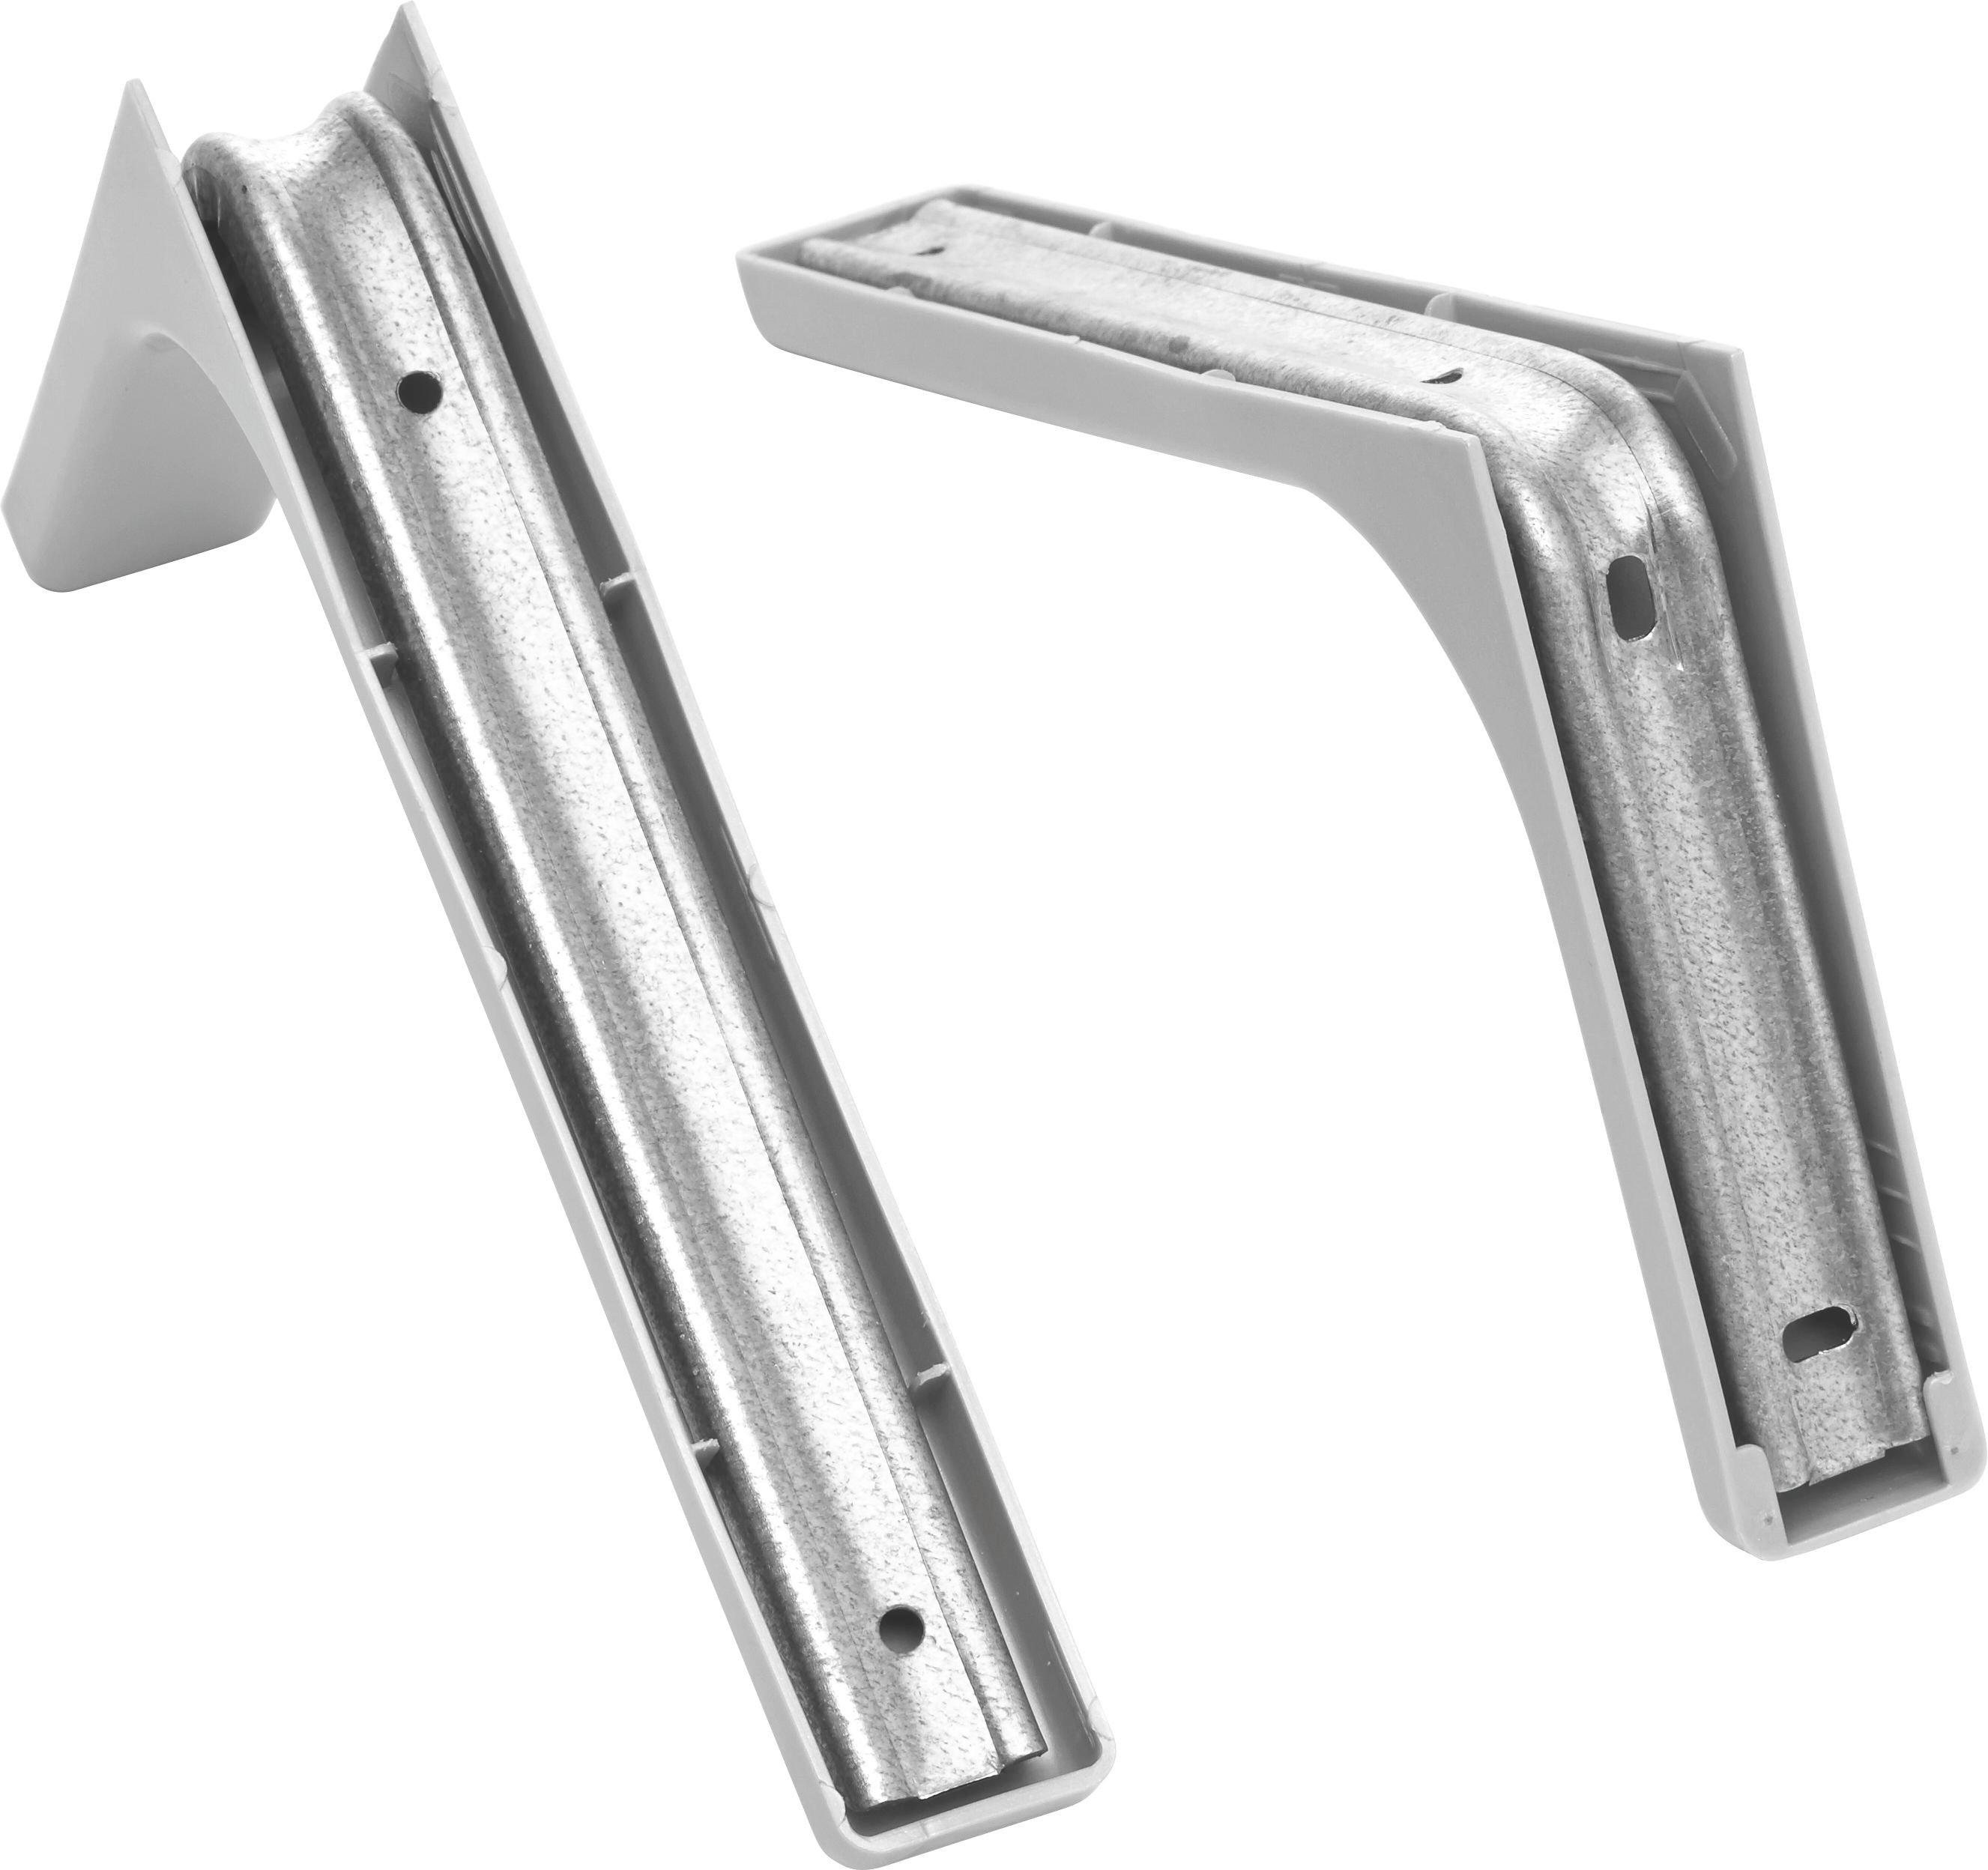 Wandhalter Silberfarben aus Metall - Silberfarben, Metall (24cm) - MÖMAX modern living